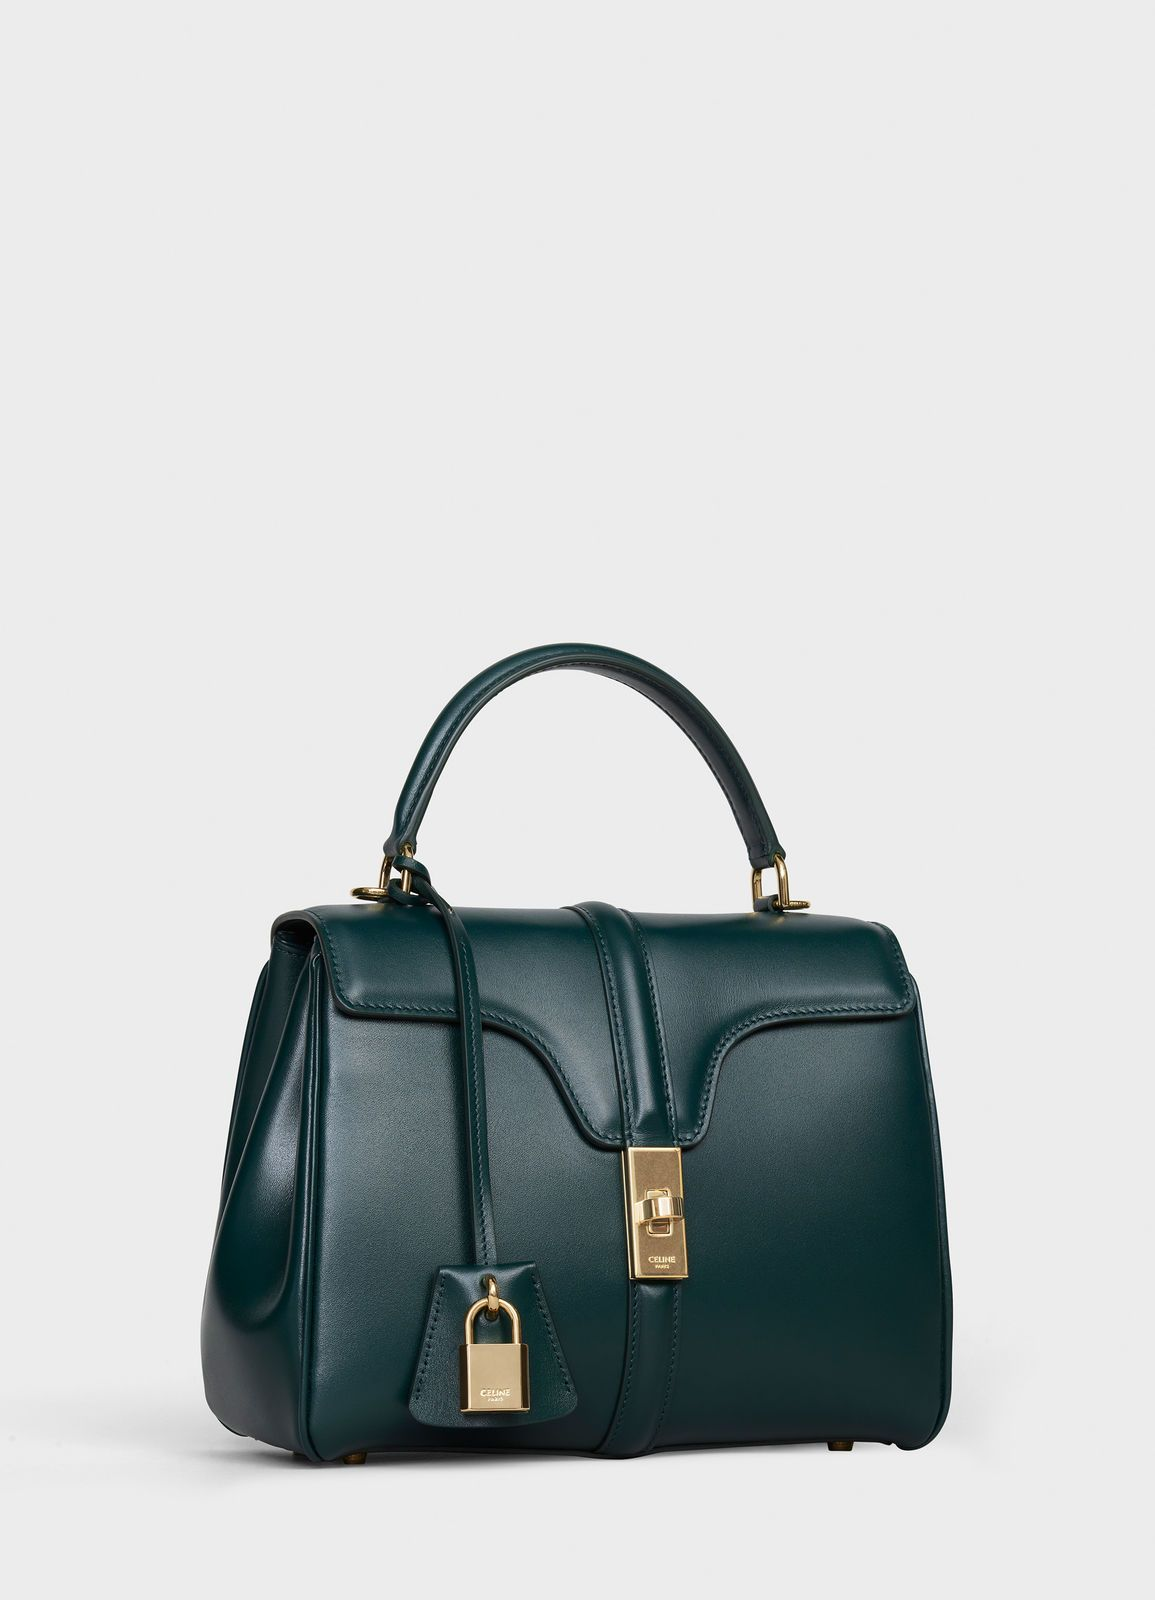 9c74b85ec3e Small 16 Bag in satinated calfskin